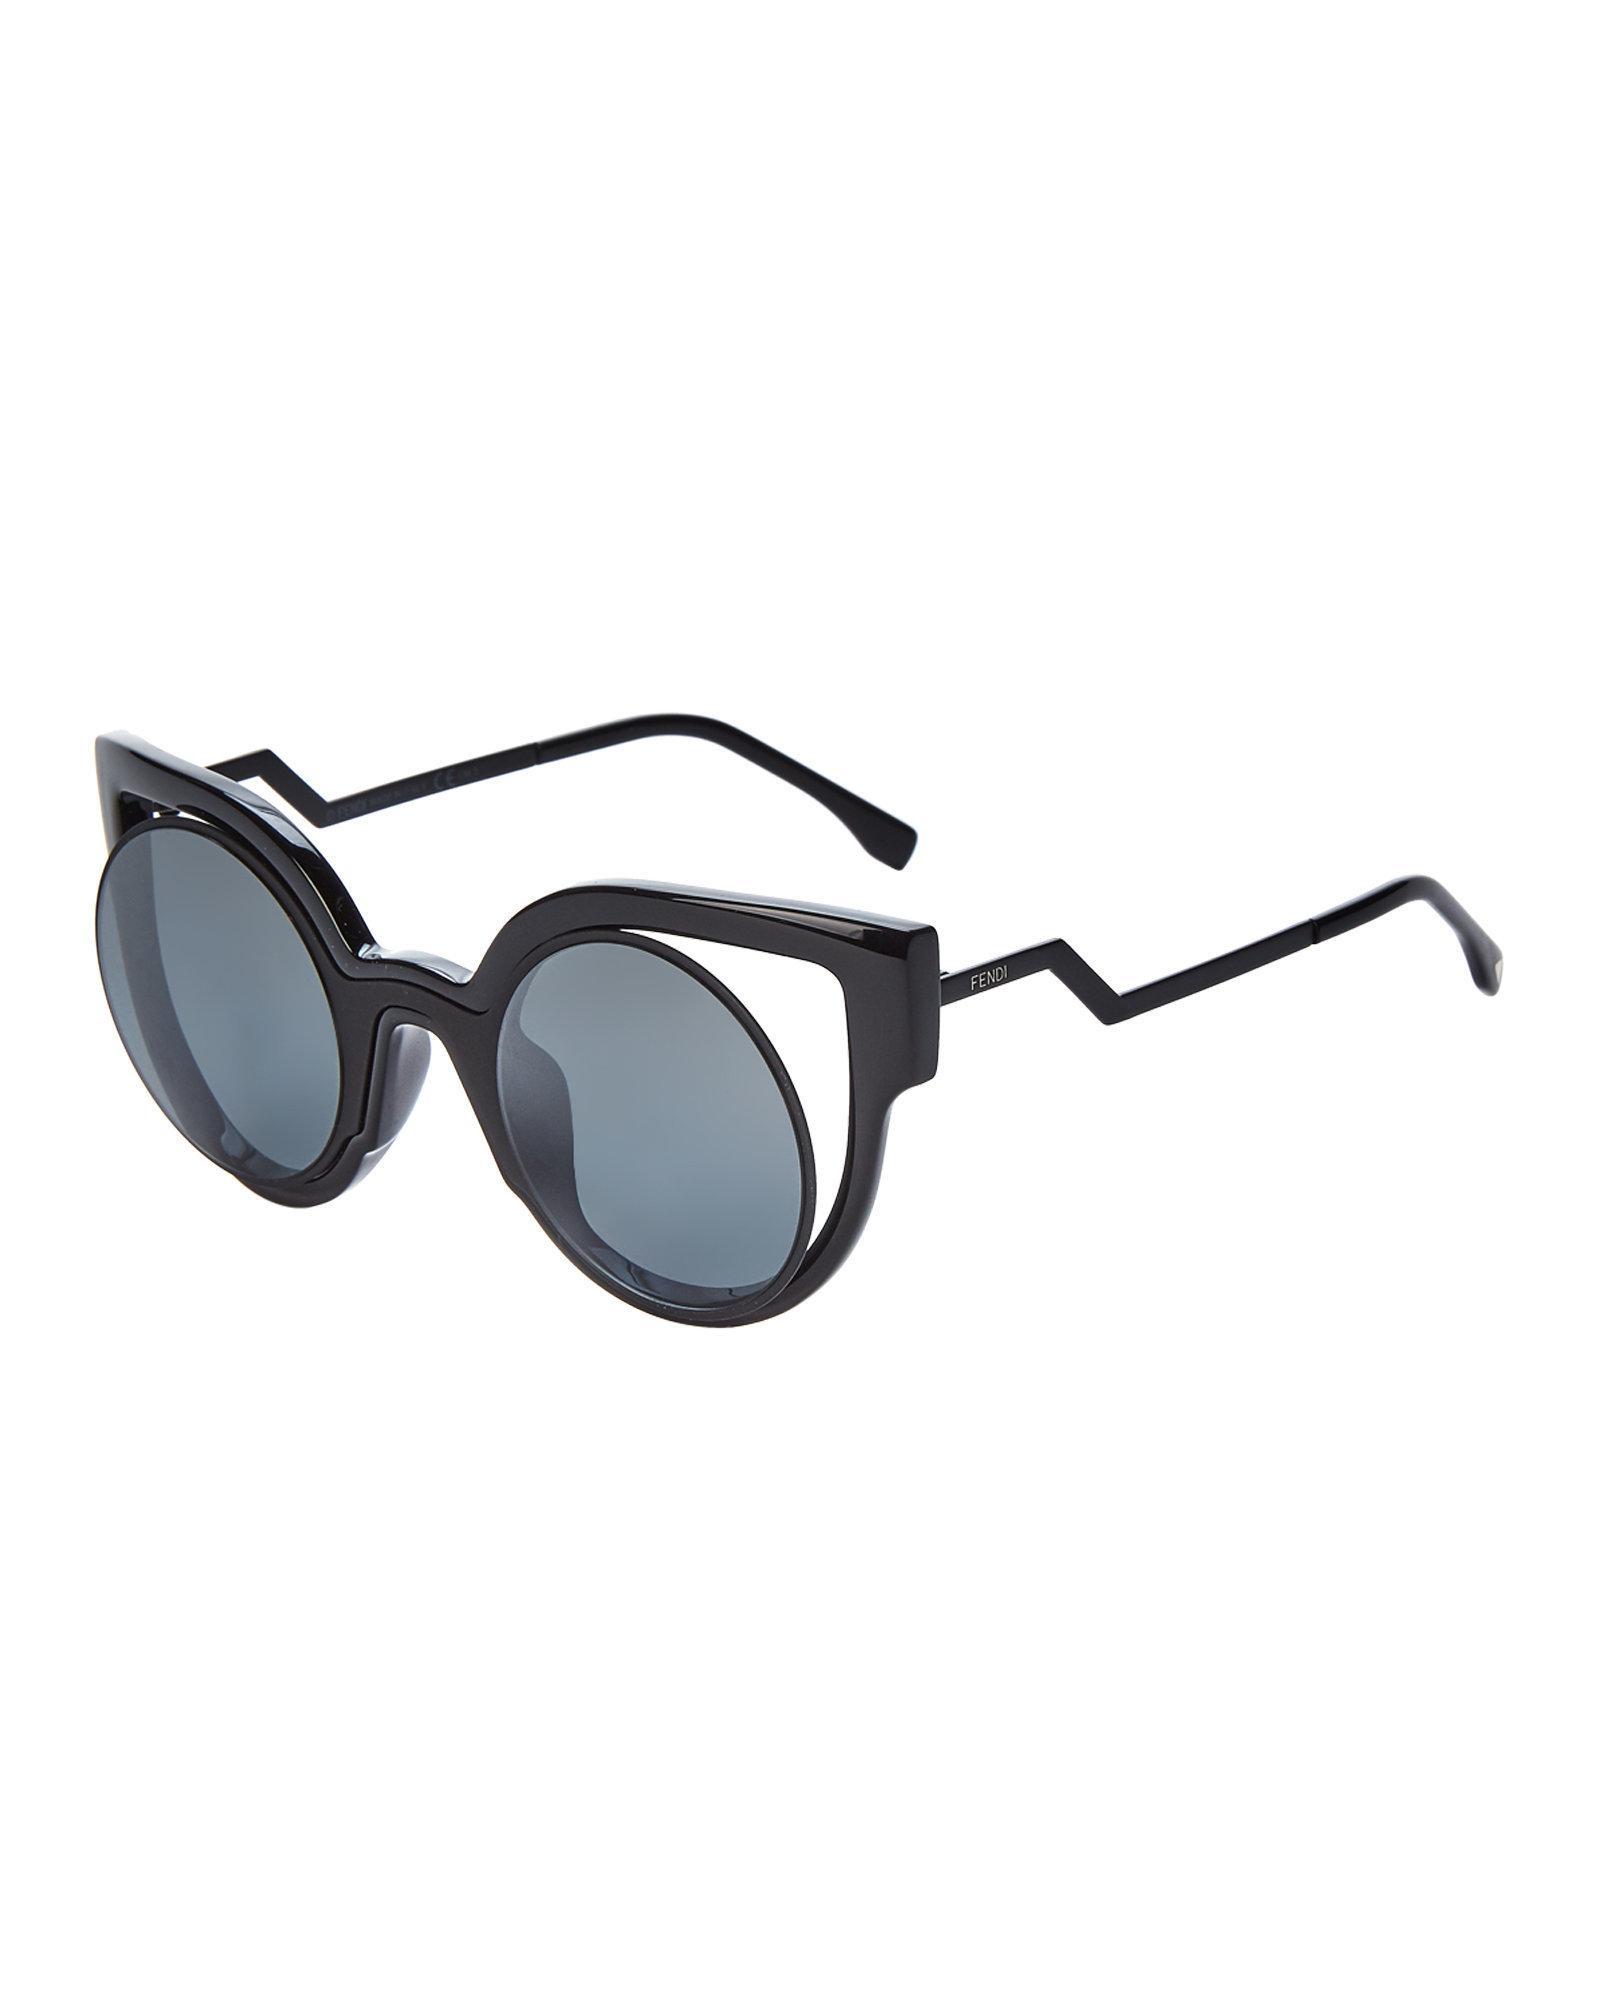 74be2d811ed1 Lyst - Fendi Ff0137/s Black Cutout Cat Eye Sunglasses in Black